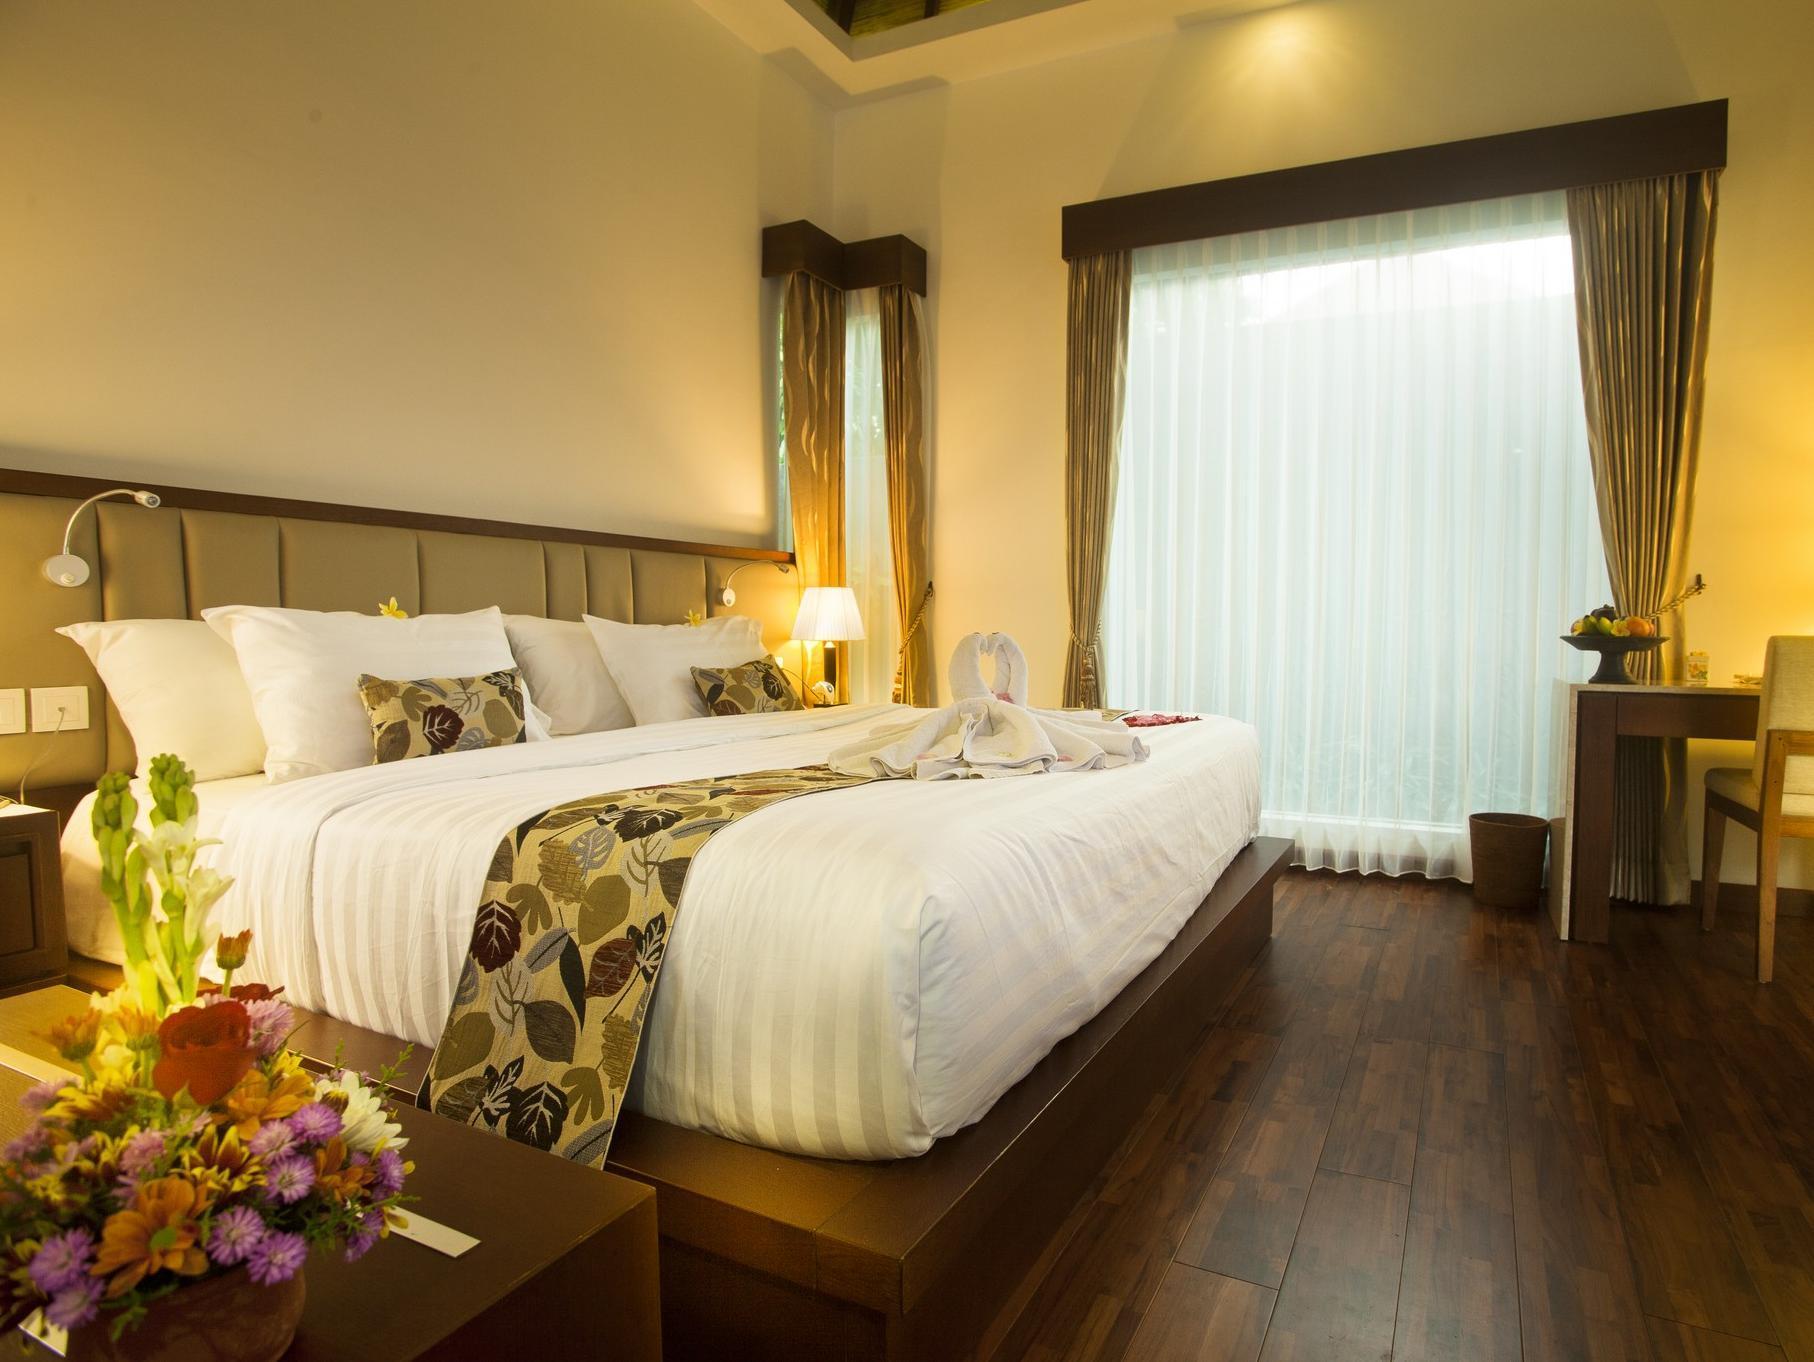 The Astari Villa & Residence